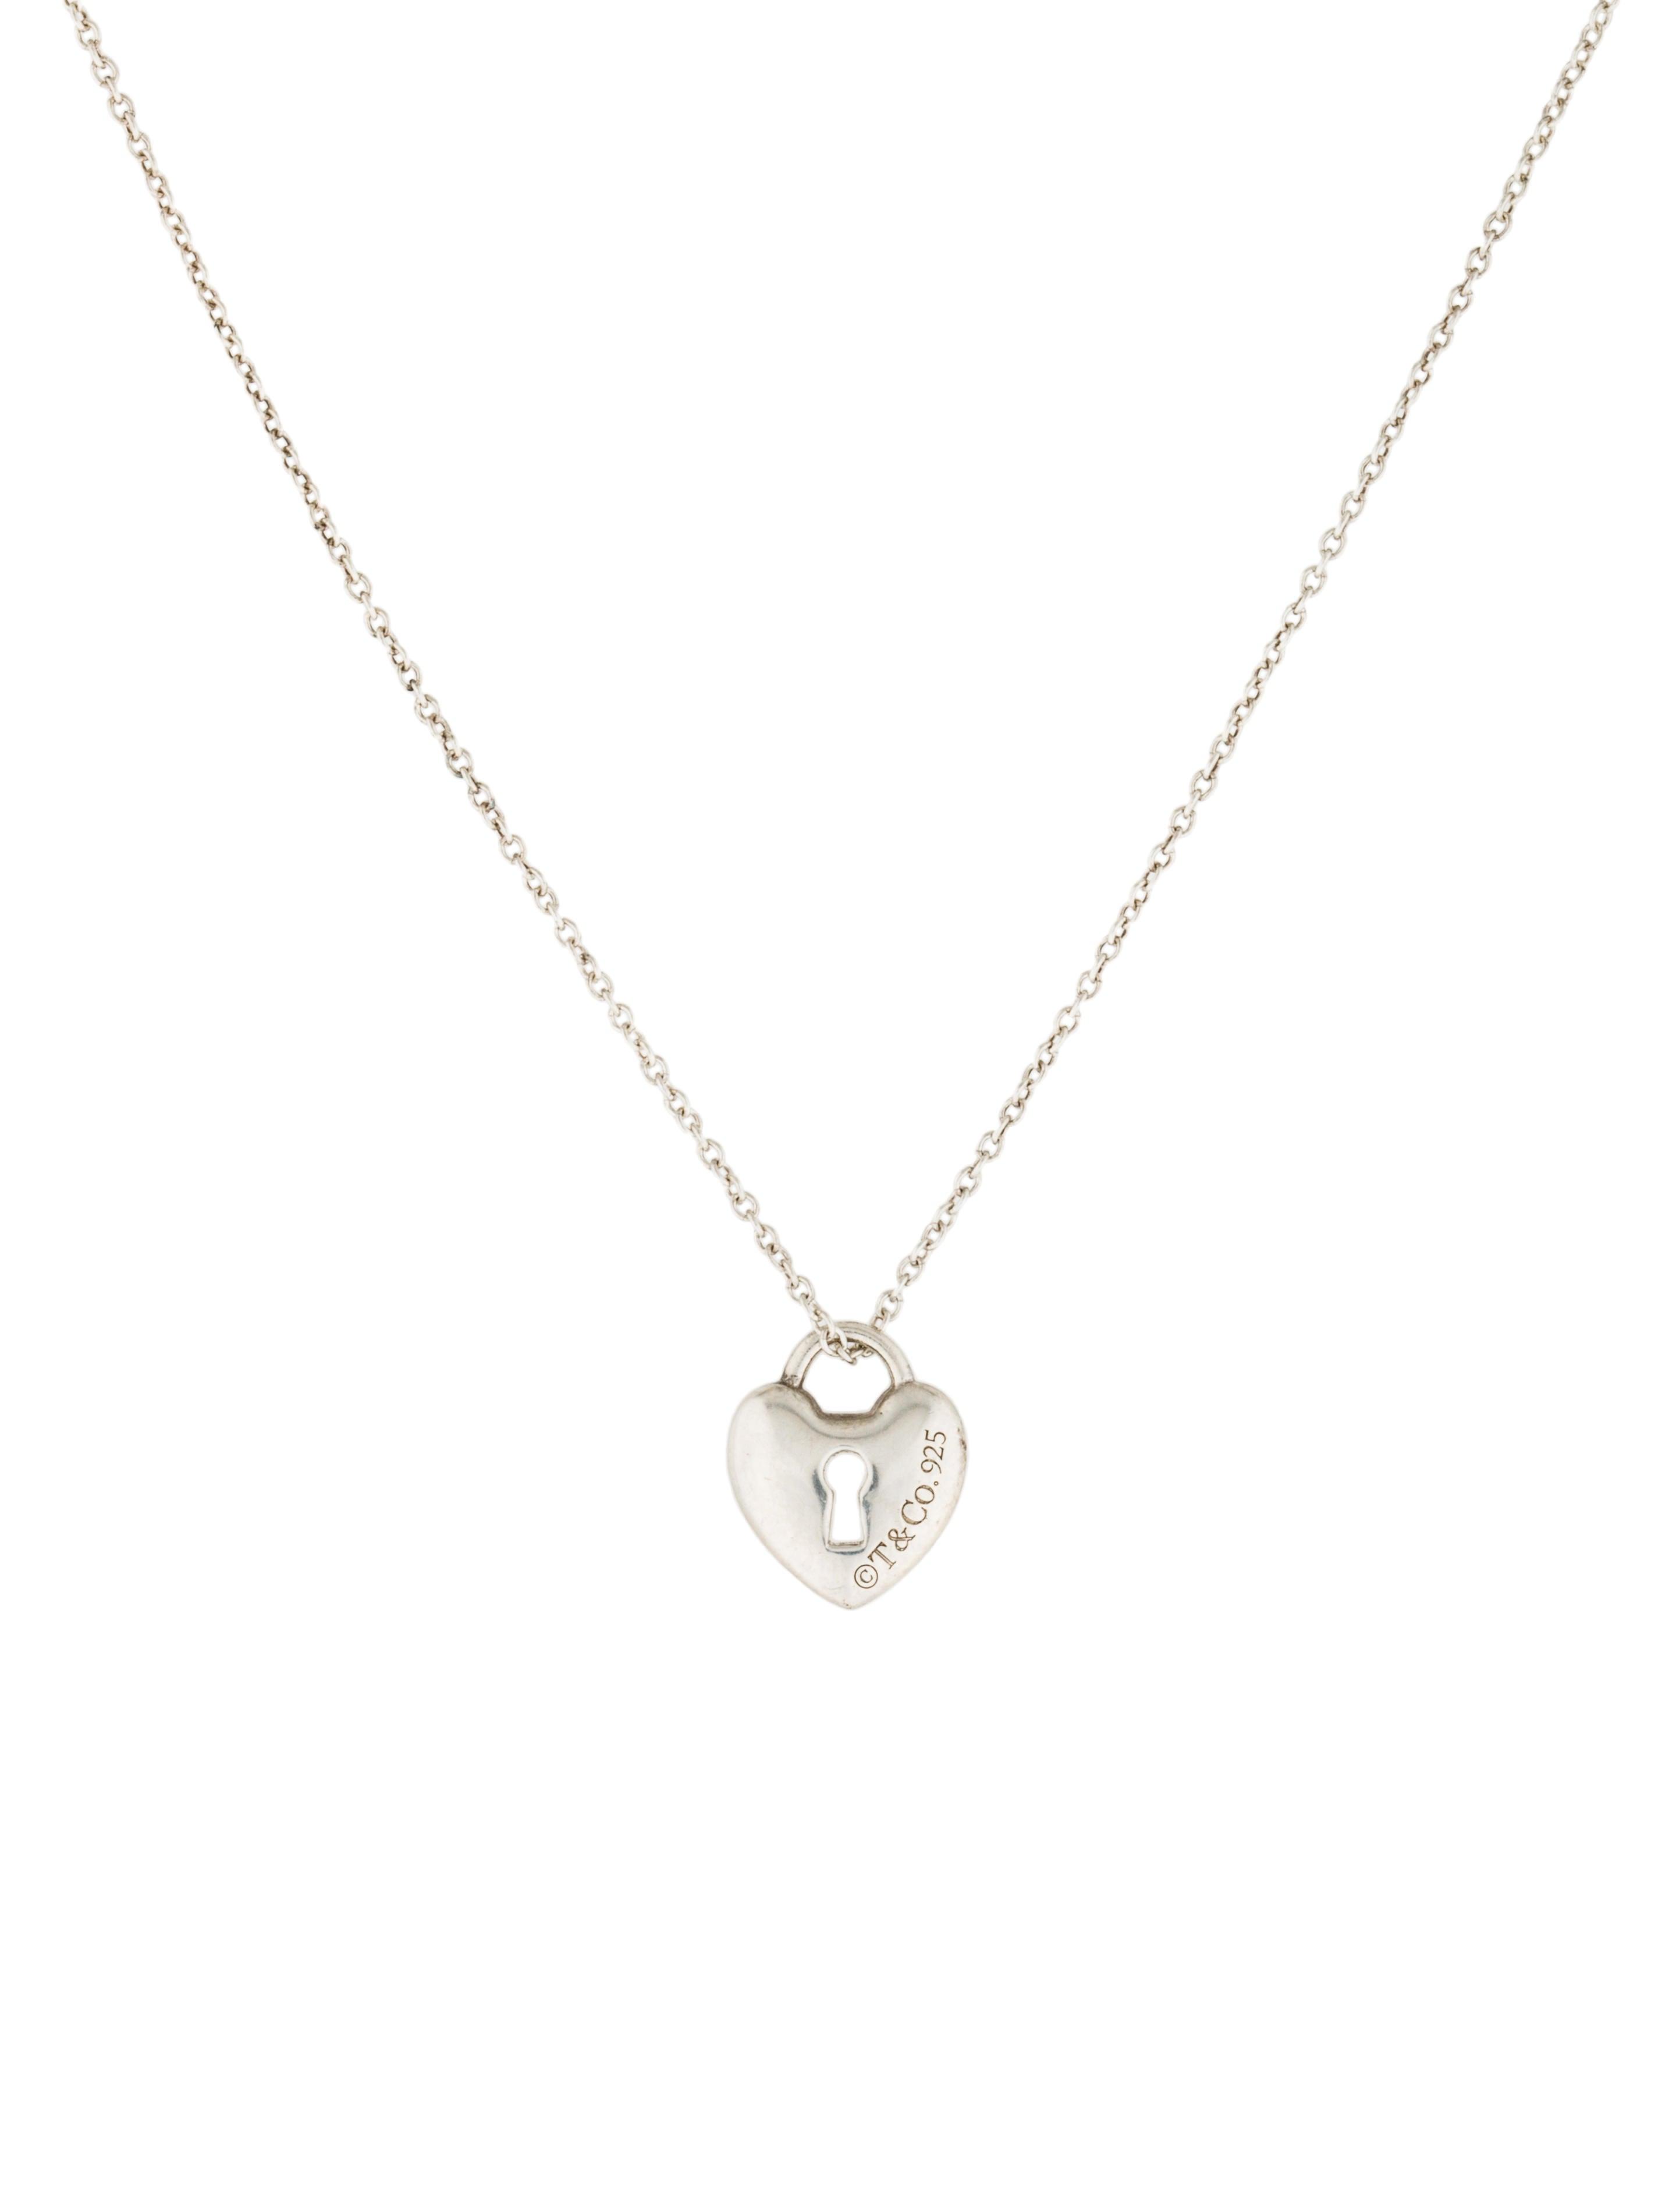 Tiffany co mini heart lock pendant necklace necklaces mini heart lock pendant necklace aloadofball Images